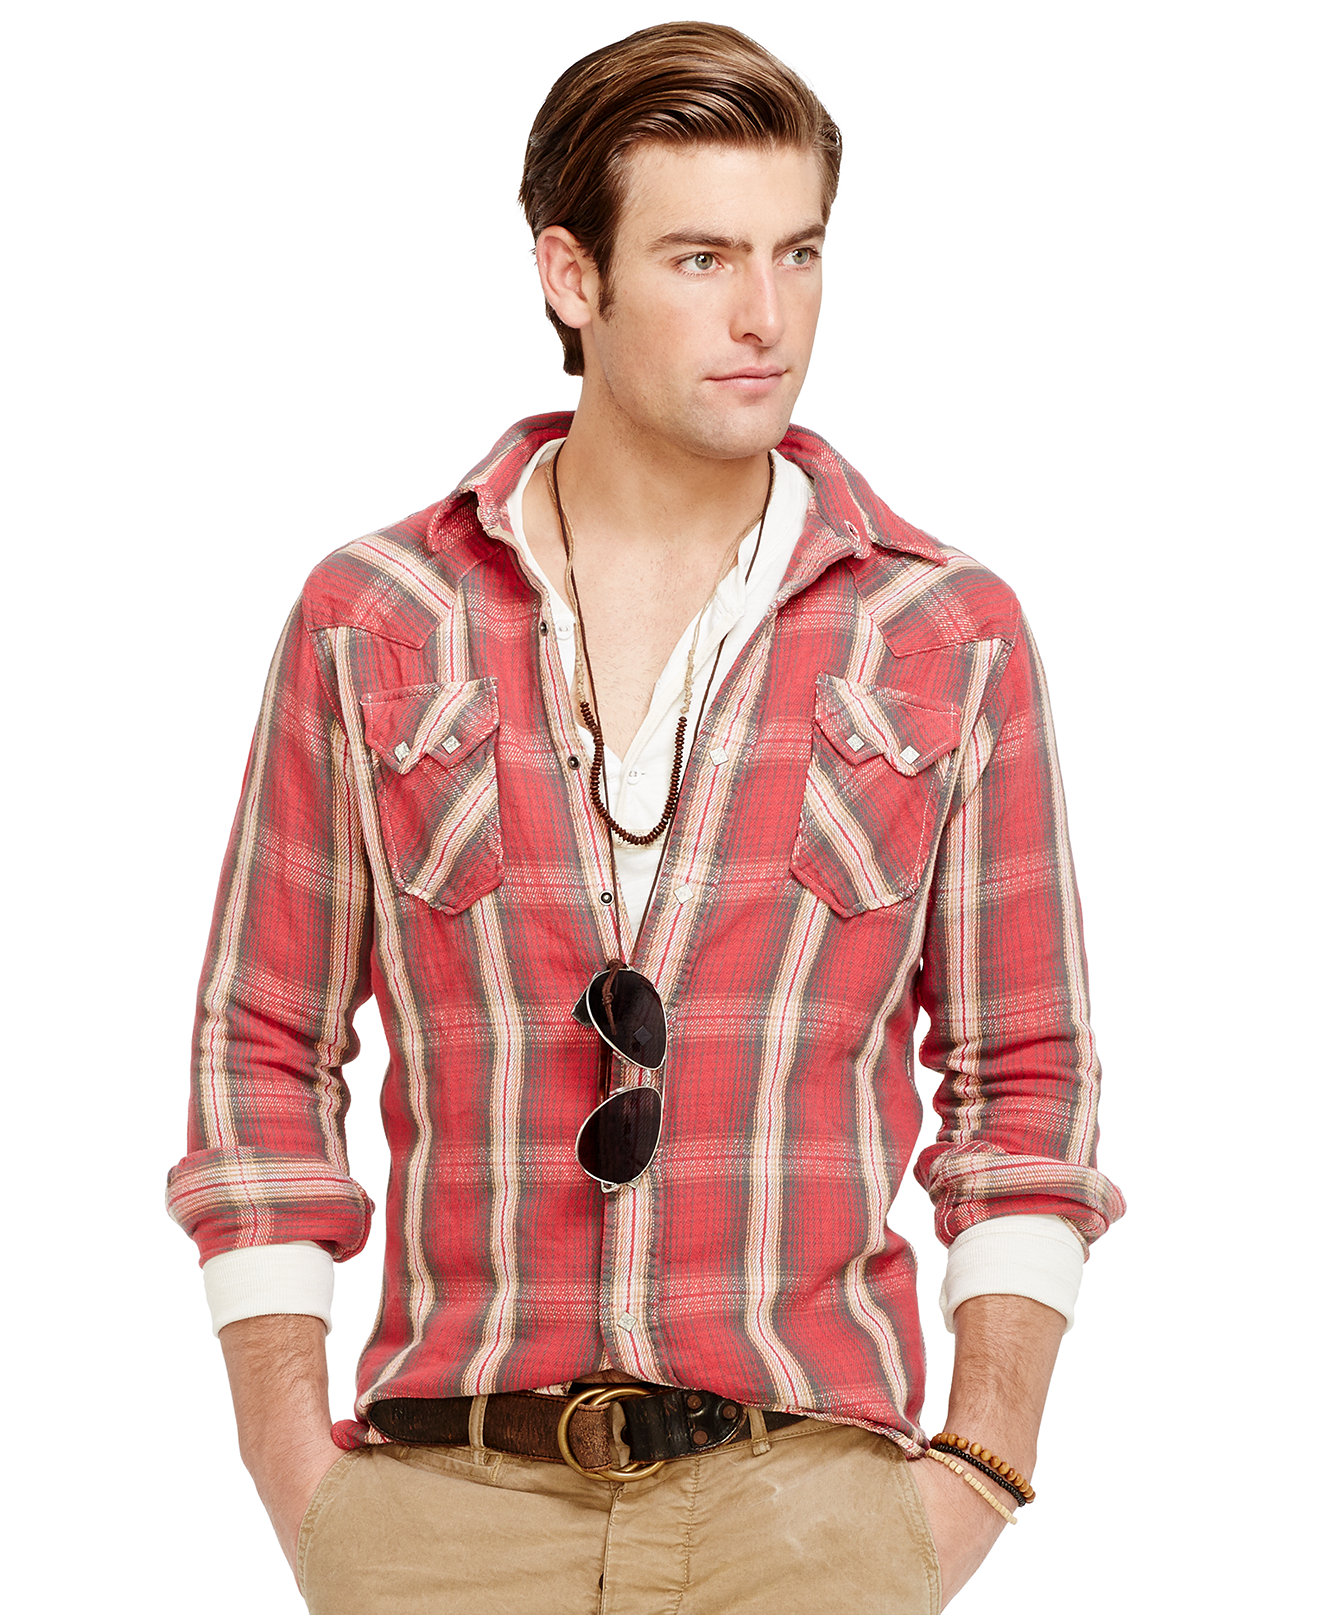 Рубашка мужская Polo ralph lauren  2015 POLO рубашка мужская polo by ralph lauren q01535190 polo ralph lauren